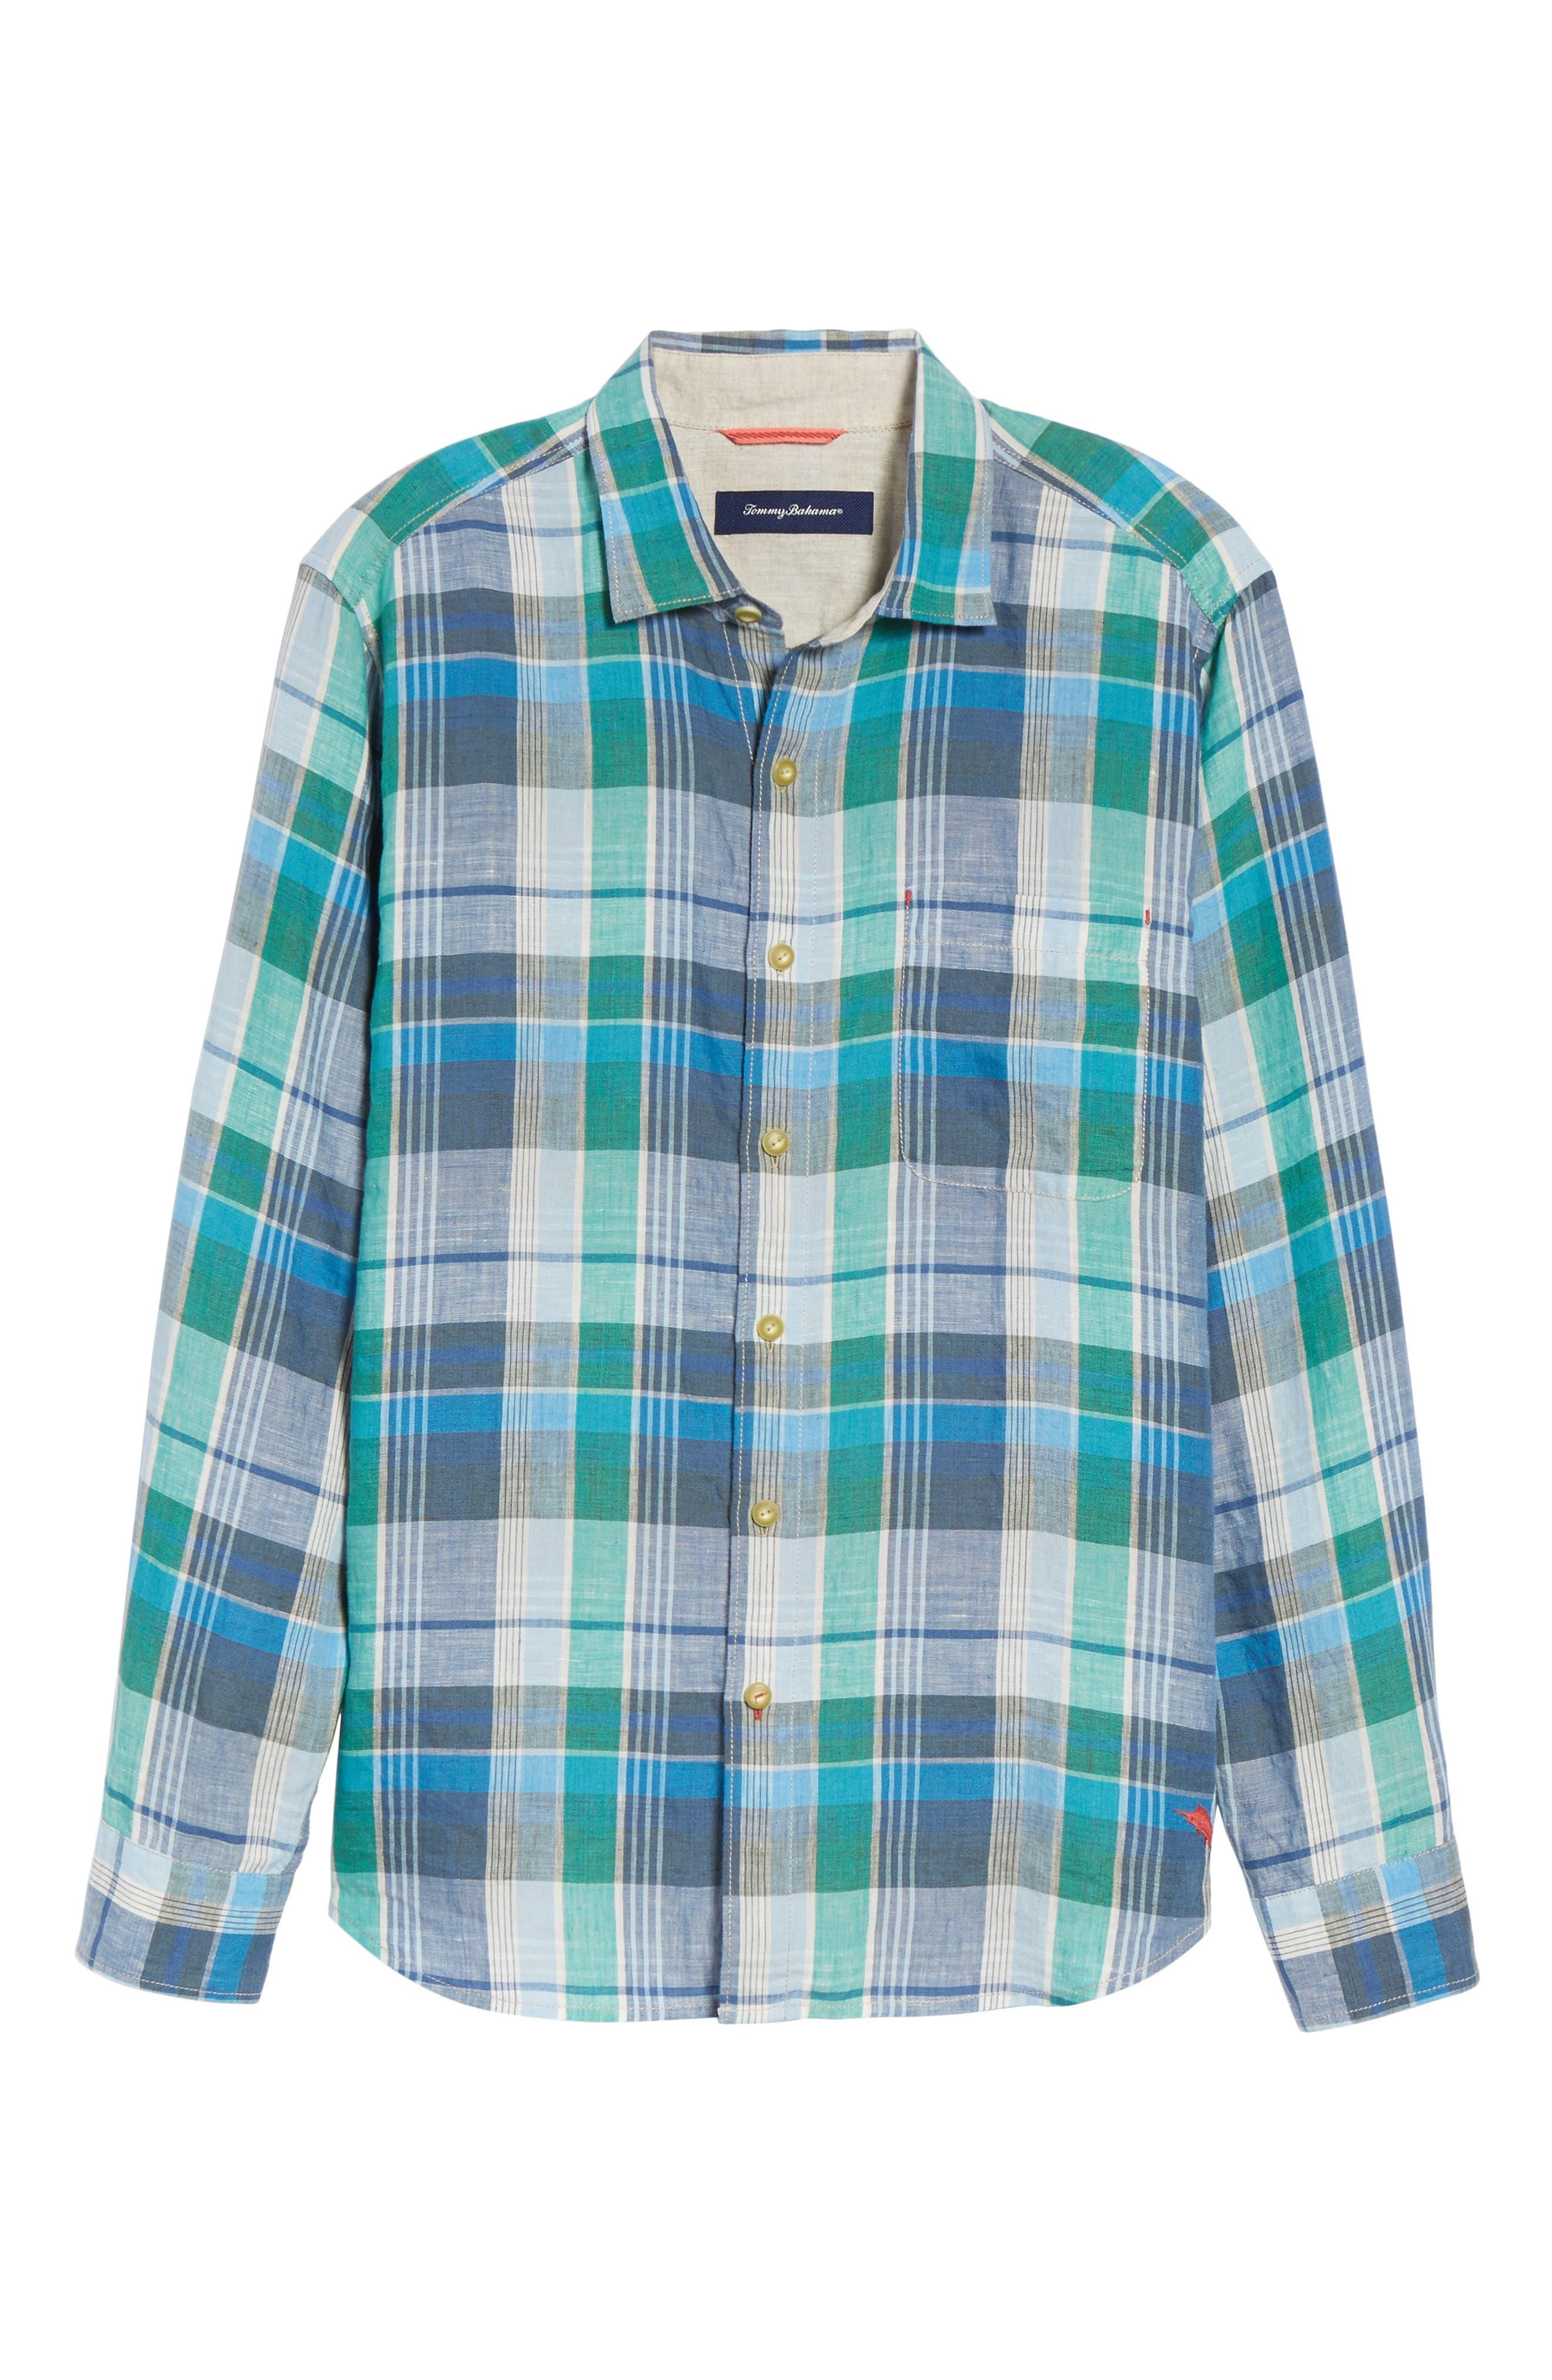 TOMMY BAHAMA,                             Vero Beach Madras Plaid Linen Sport Shirt,                             Alternate thumbnail 6, color,                             300